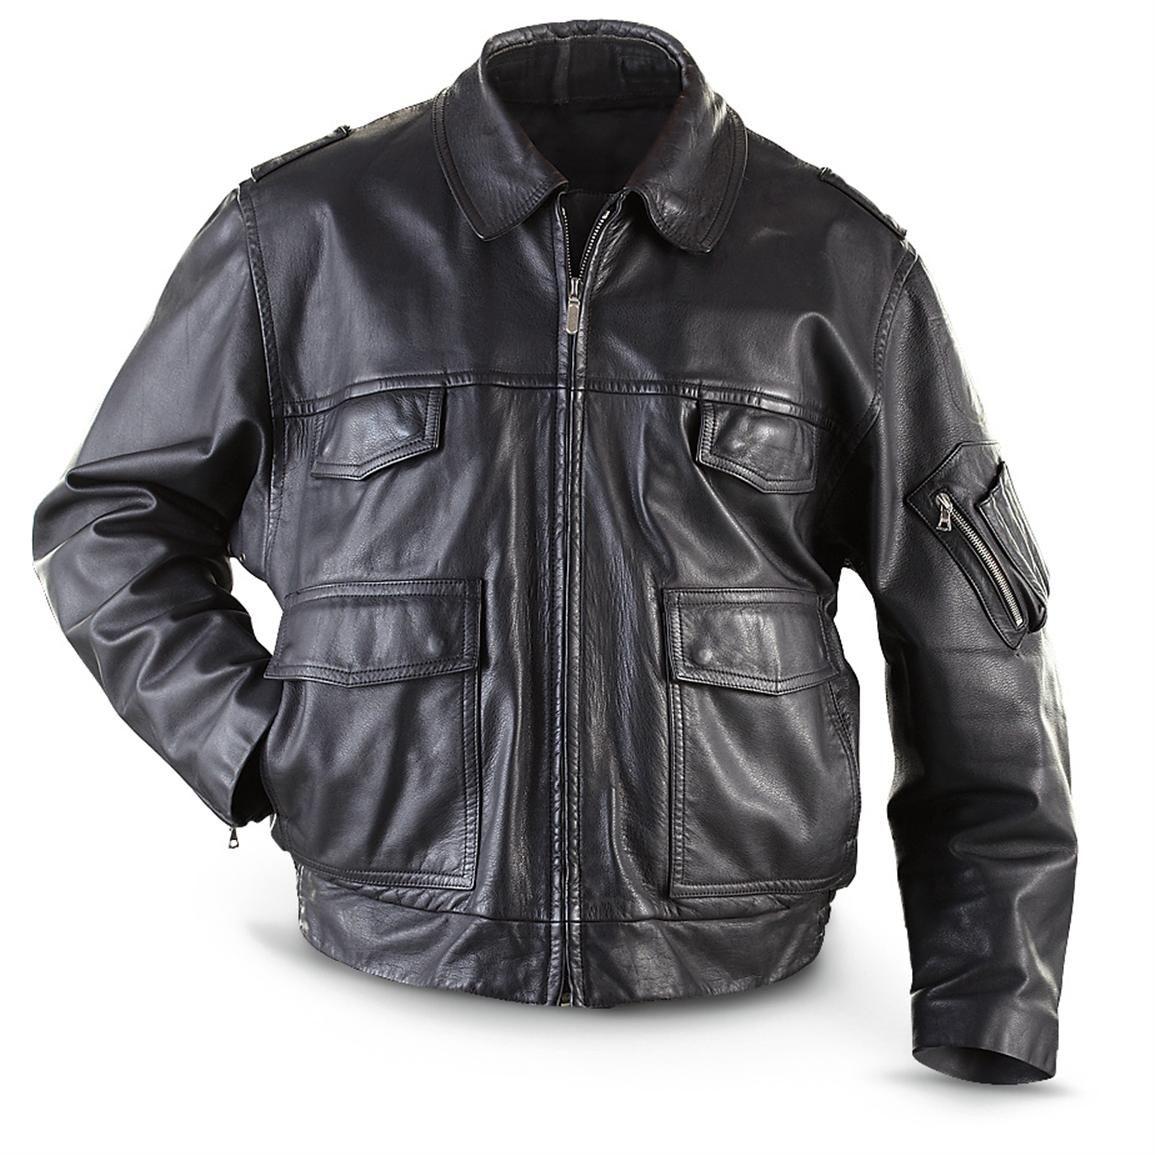 ae829f8a14b Used German Military Surplus Leather Police Jacket